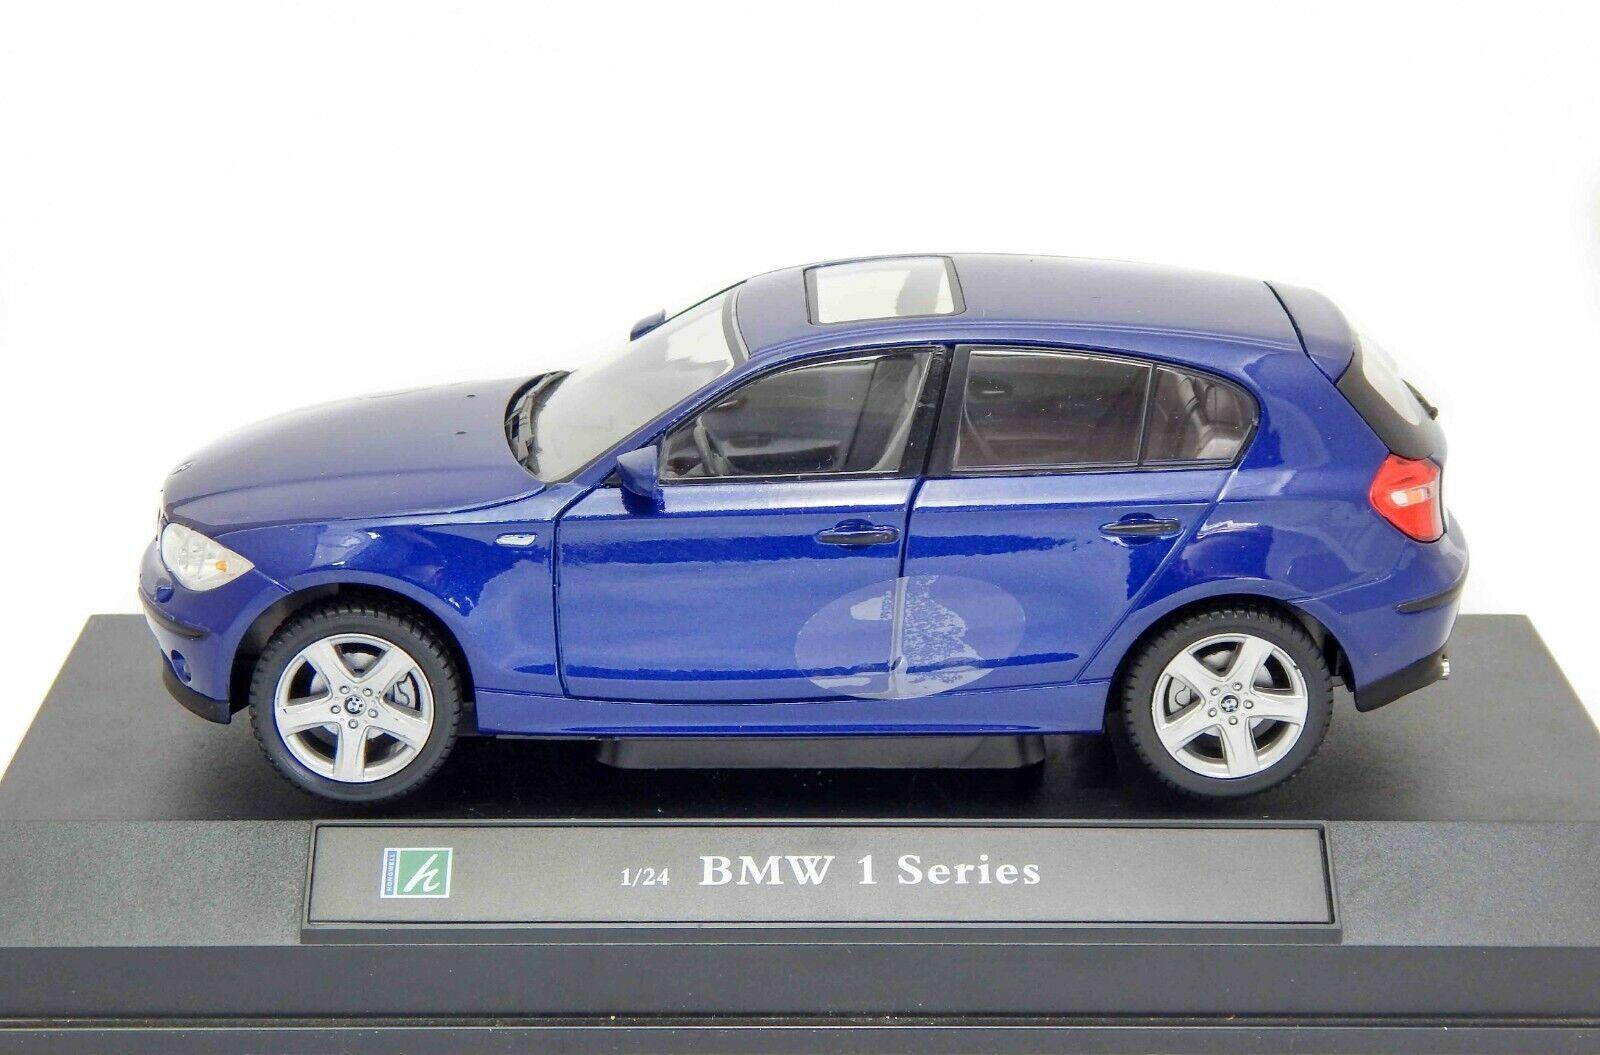 BMW Series 1 116i 118i 120i 120d 123d E87, bluee, Cararama 1 24 Model Car